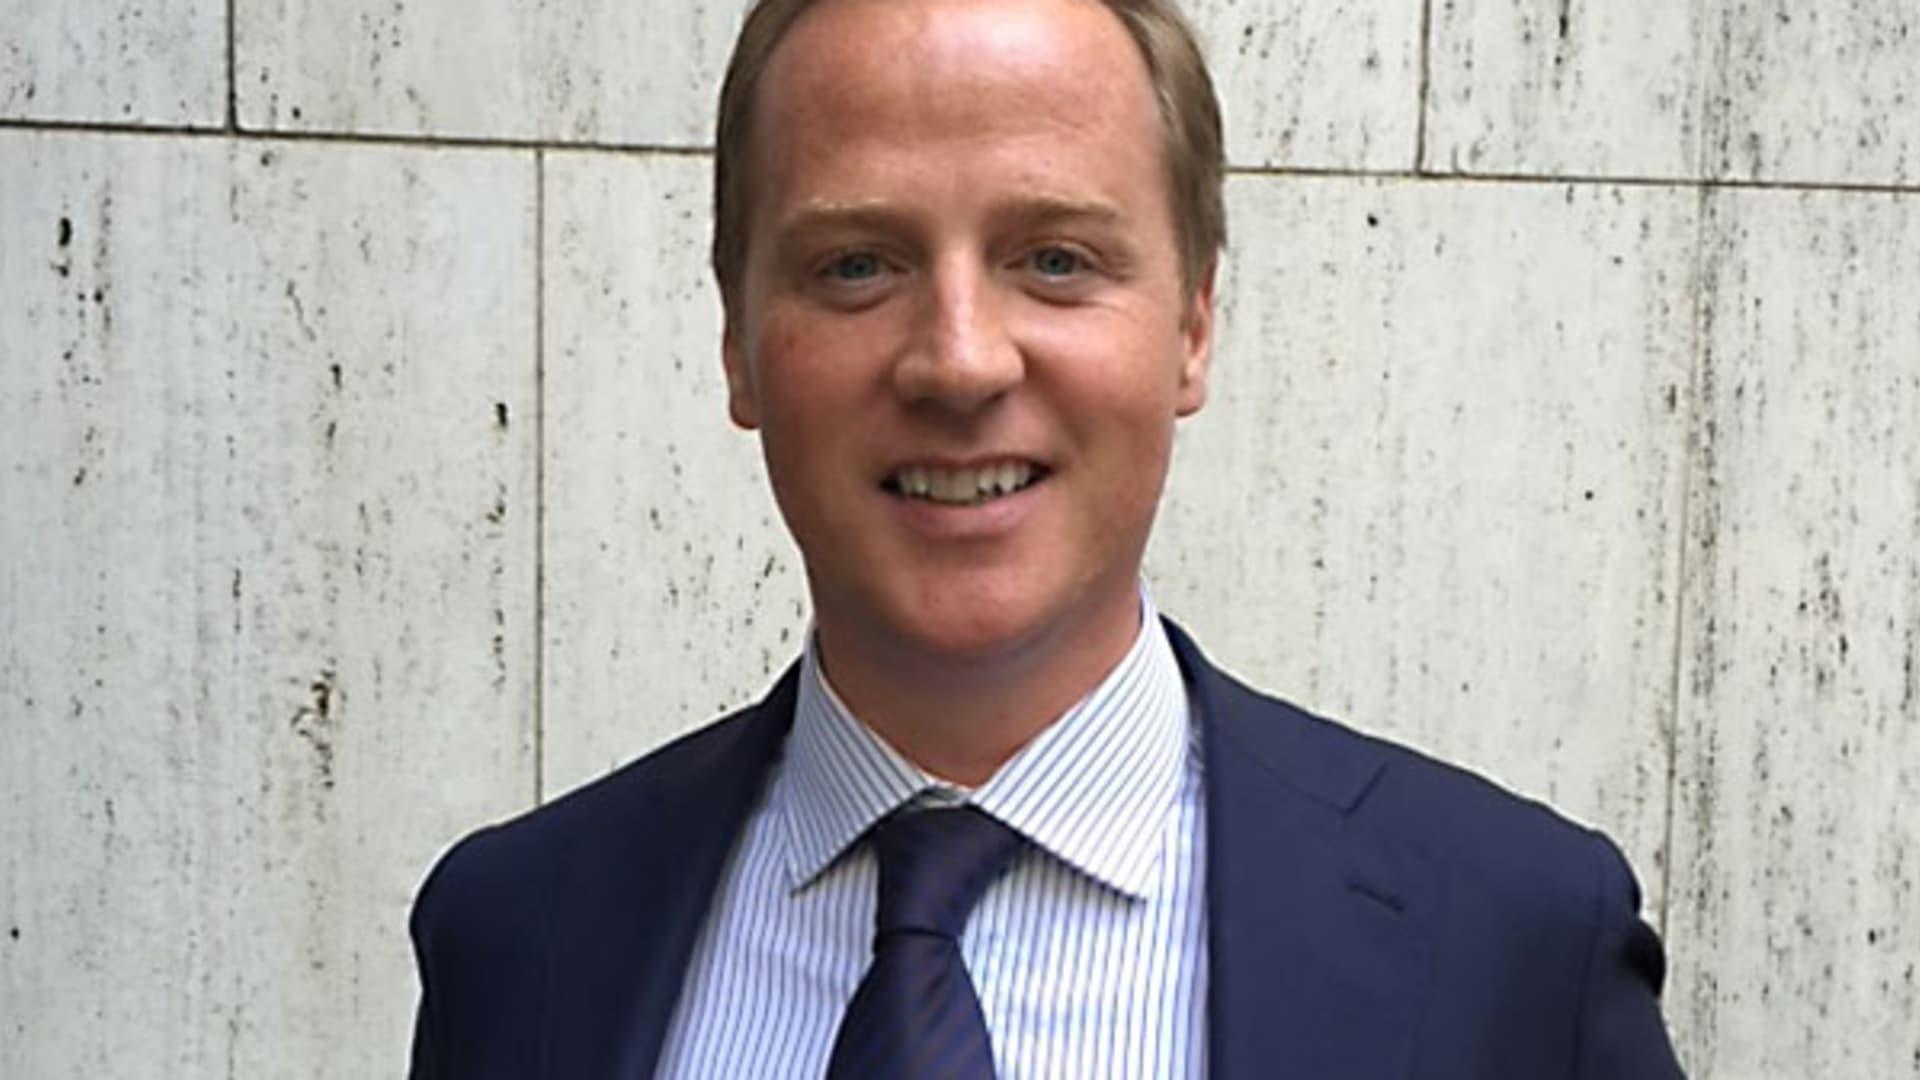 David McCormack, head of recruitment firm DMC Partners